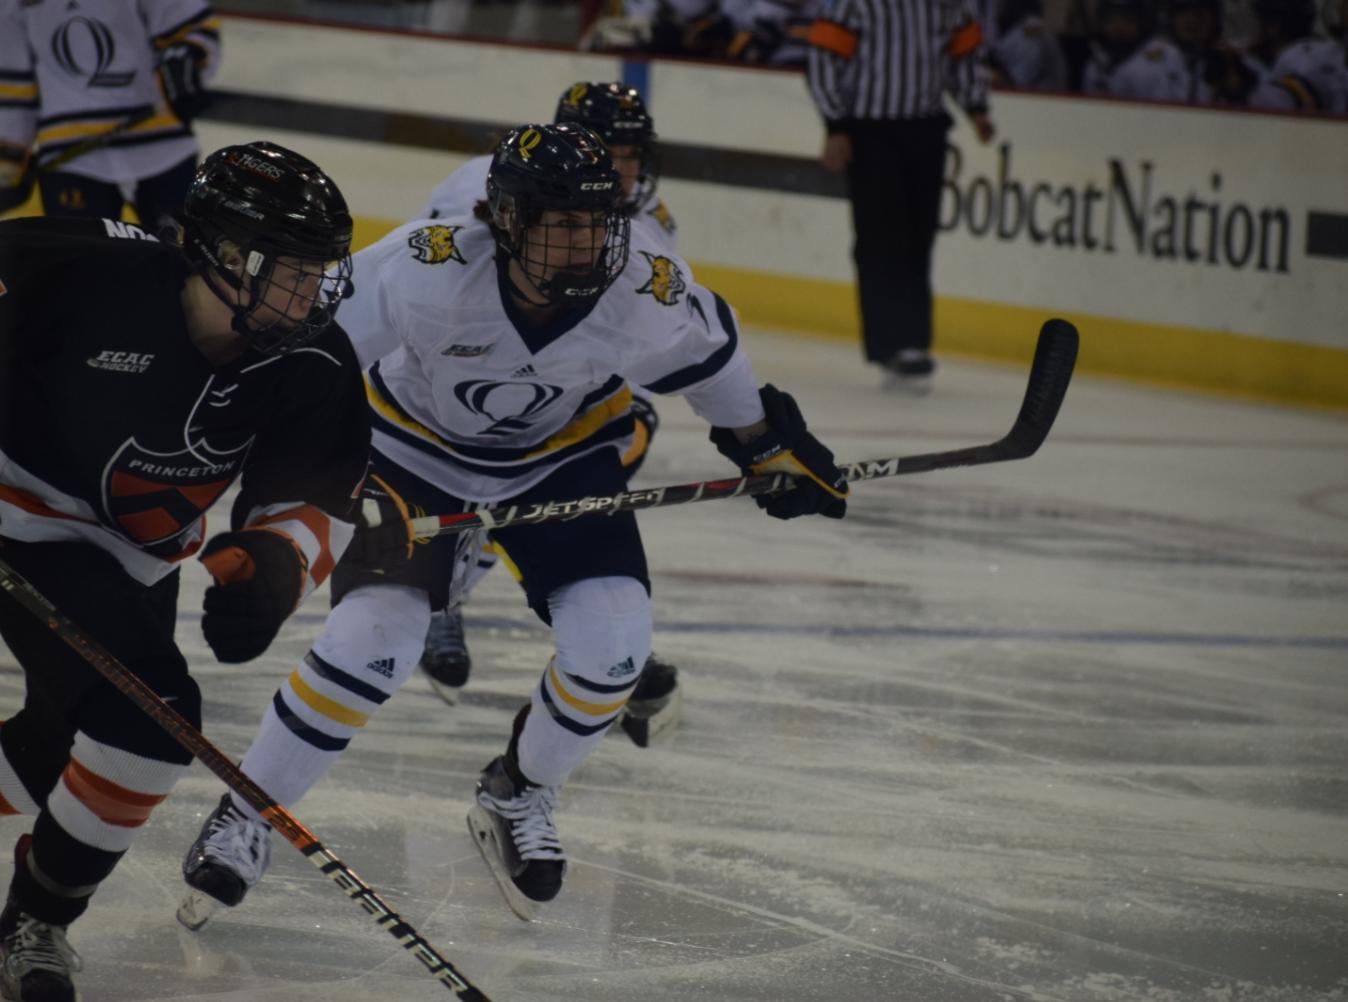 Quinnipiac women's ice hockey falls to Princeton again, 4-1